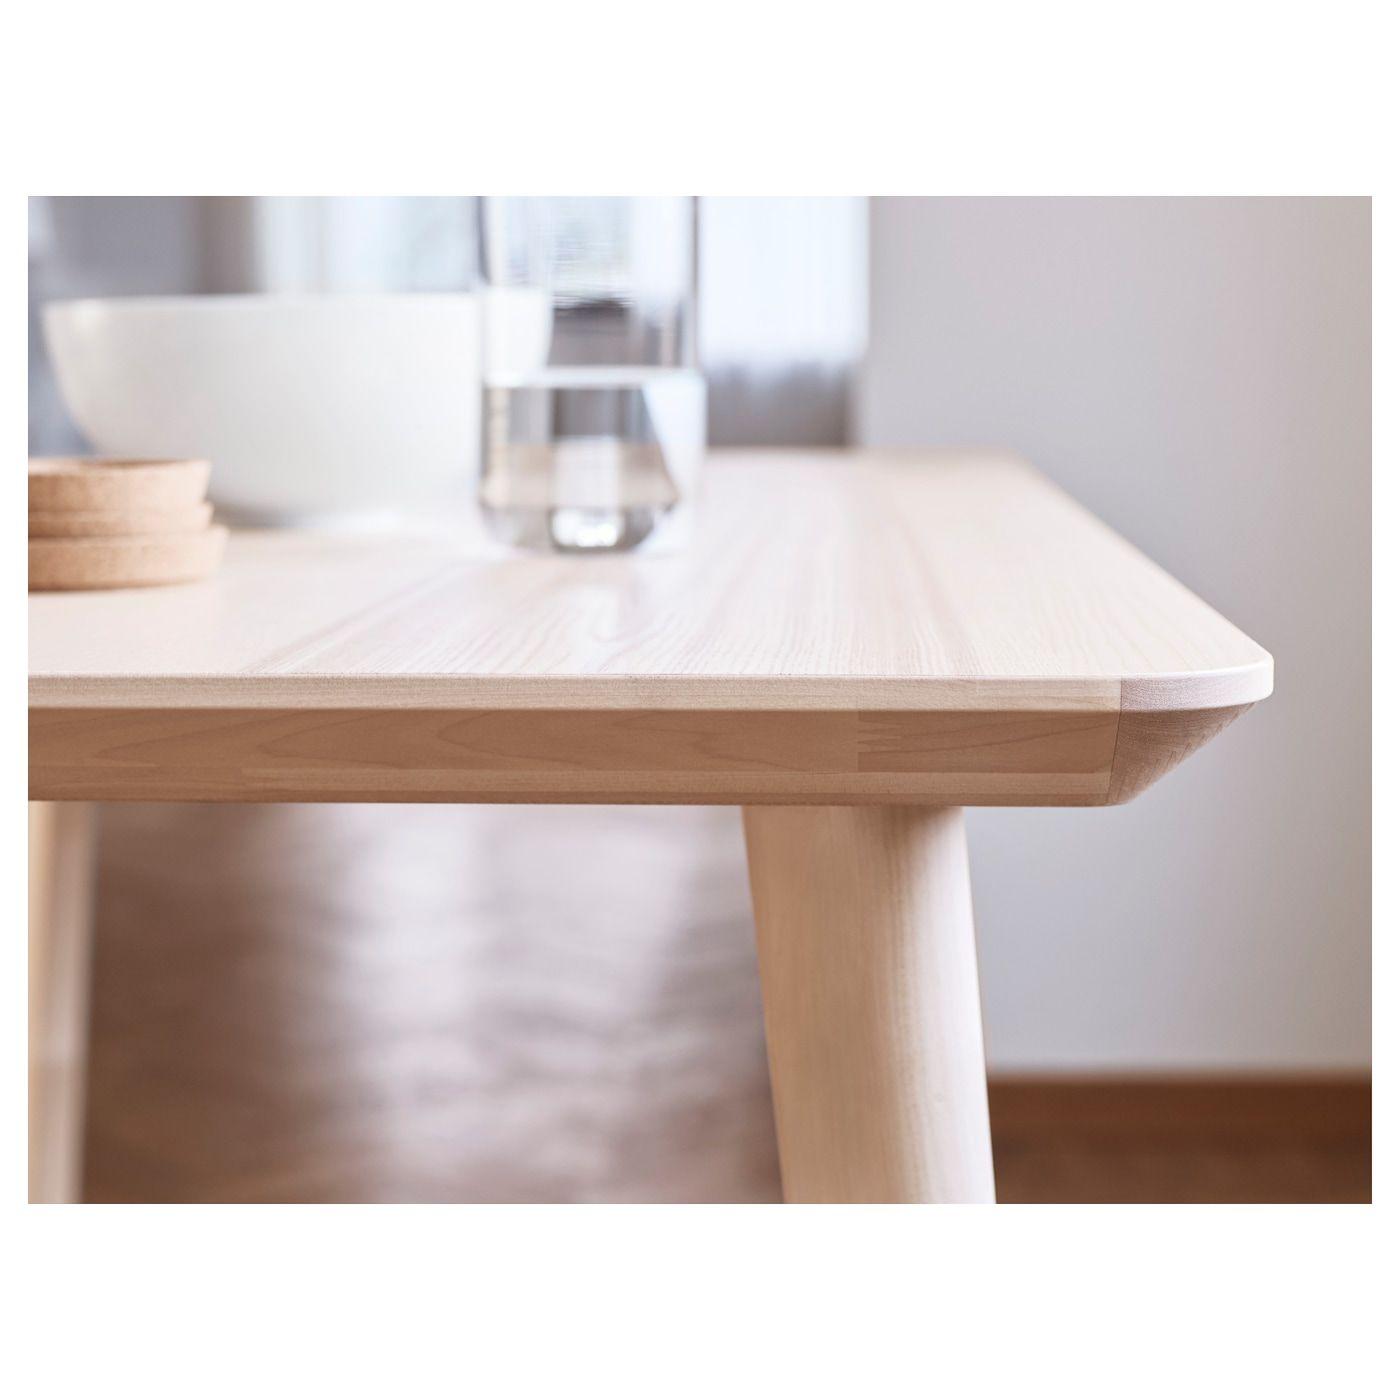 Lisabo Soffbord Askfaner 118x50 Cm Ikea In 2020 Coffee Table Classic Table Ikea [ 1400 x 1400 Pixel ]